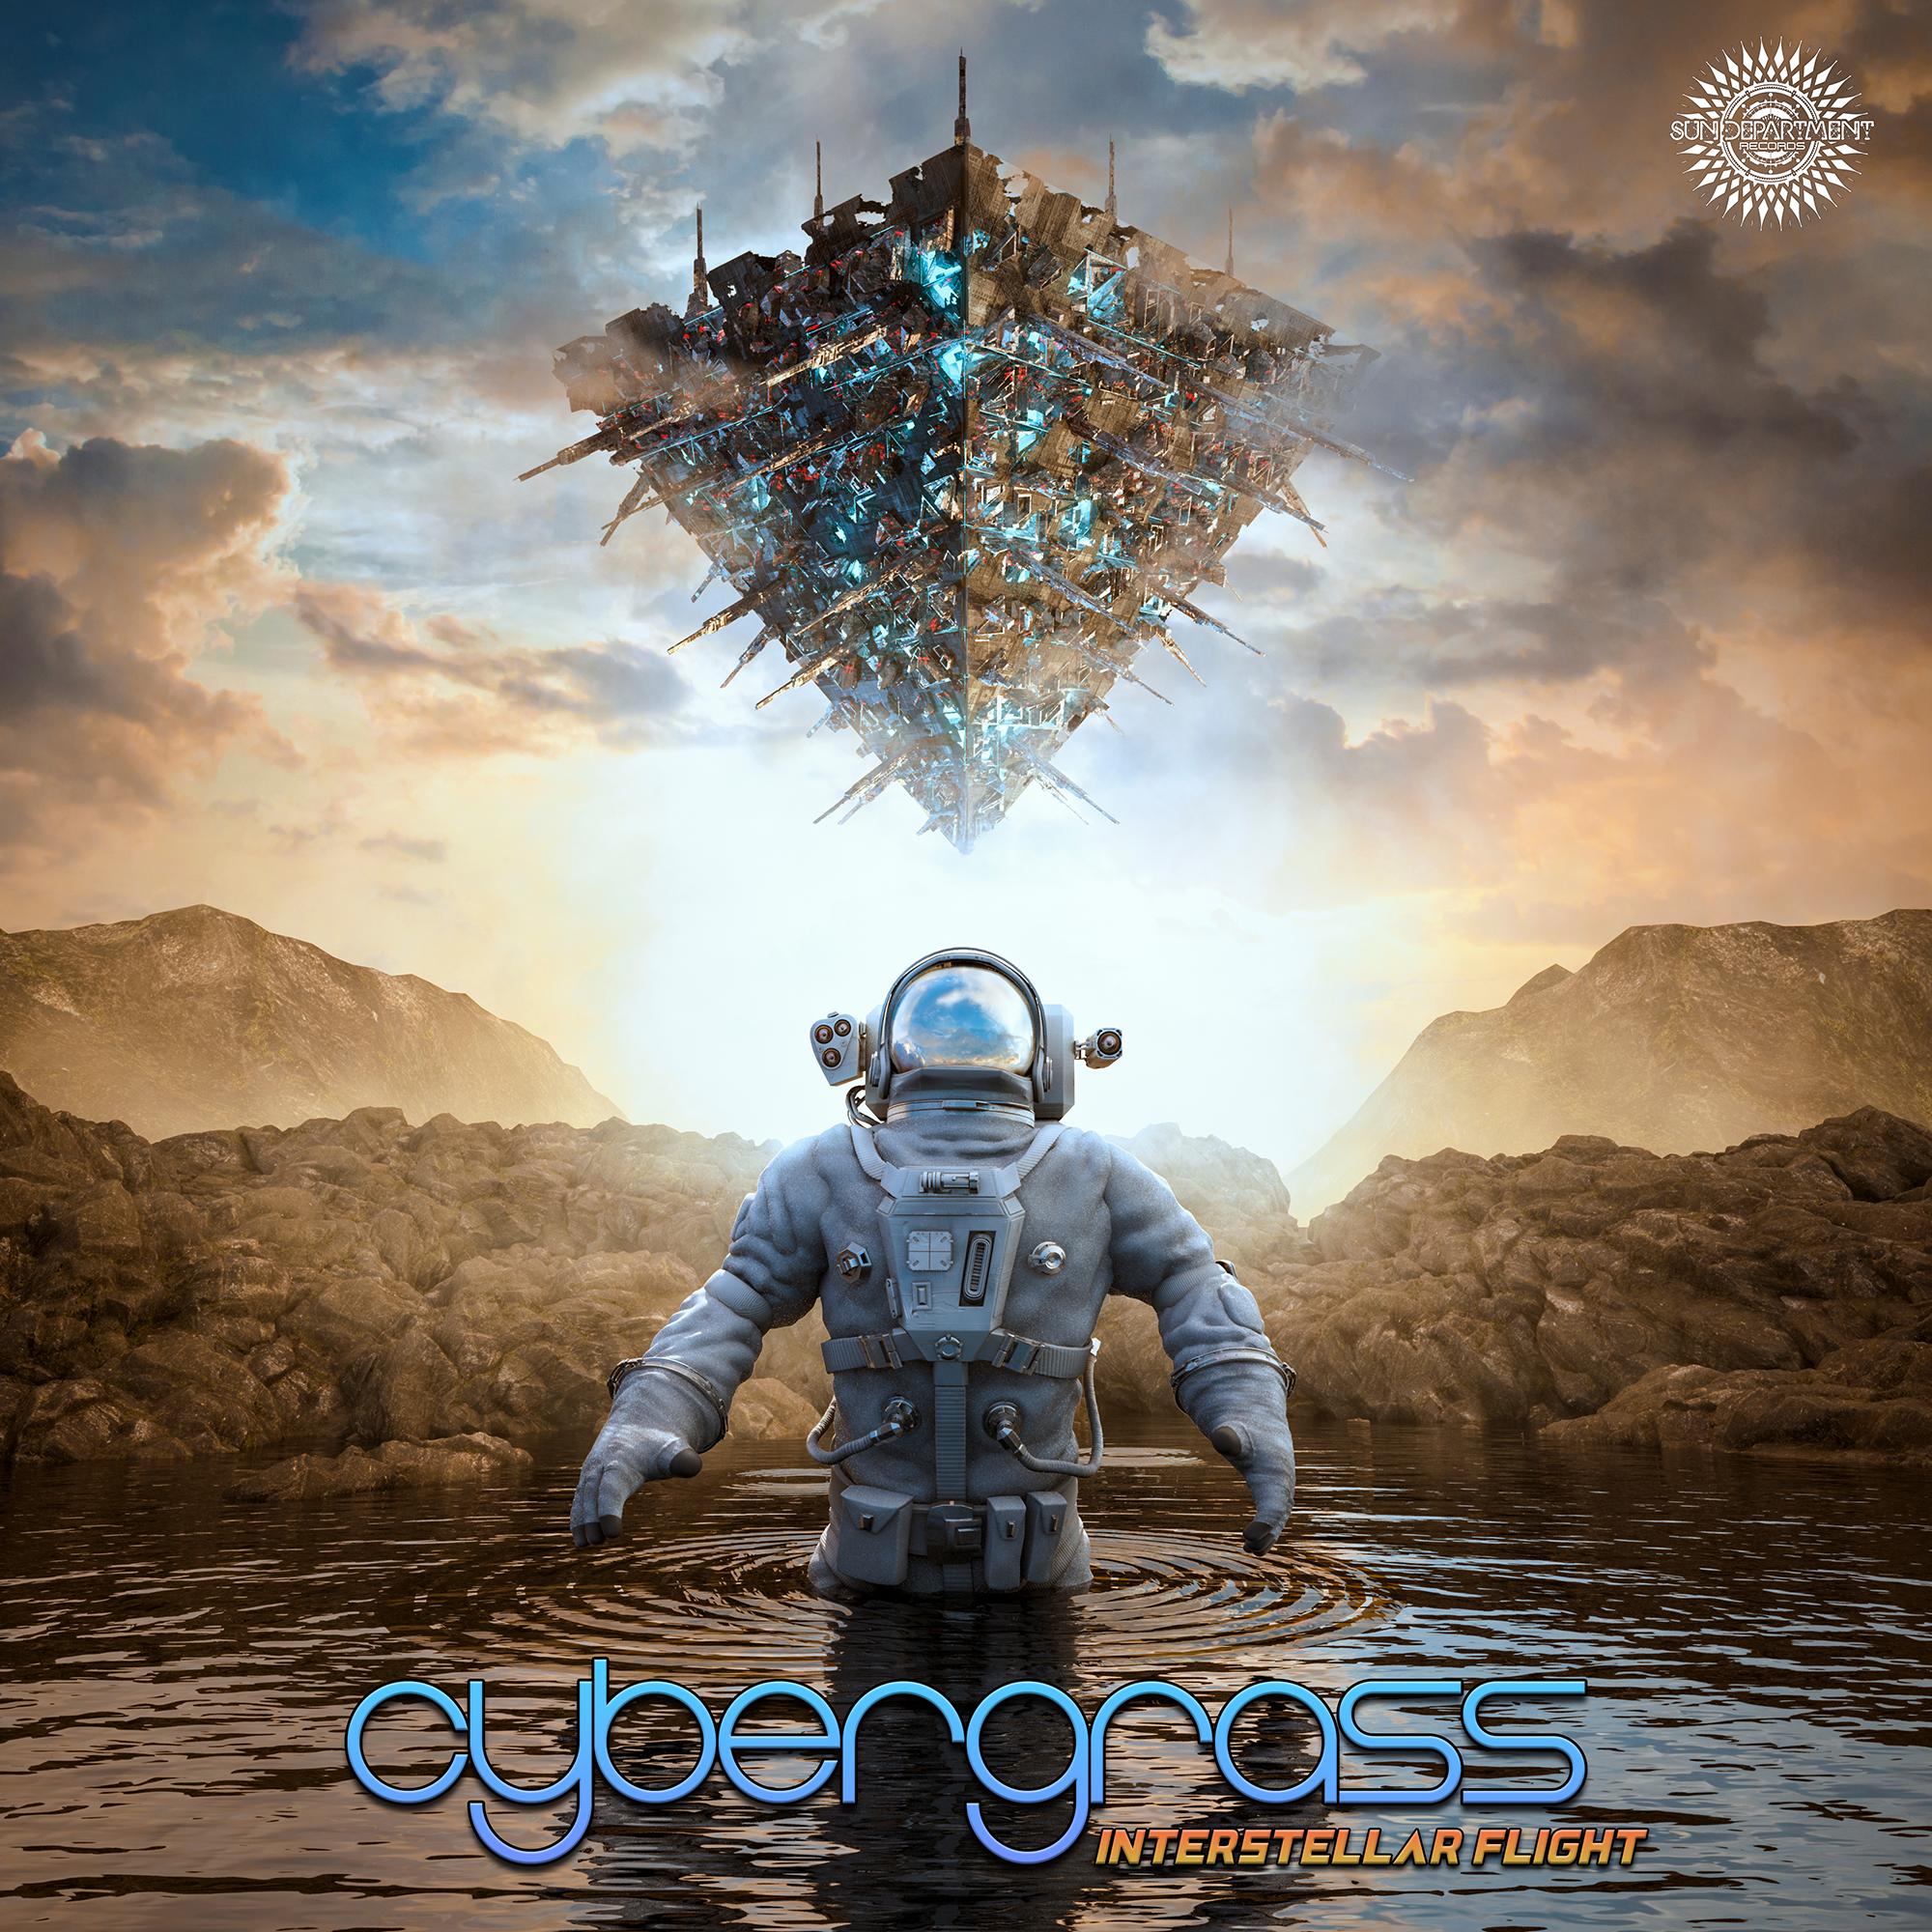 Cybergrass - Interstellar Flight